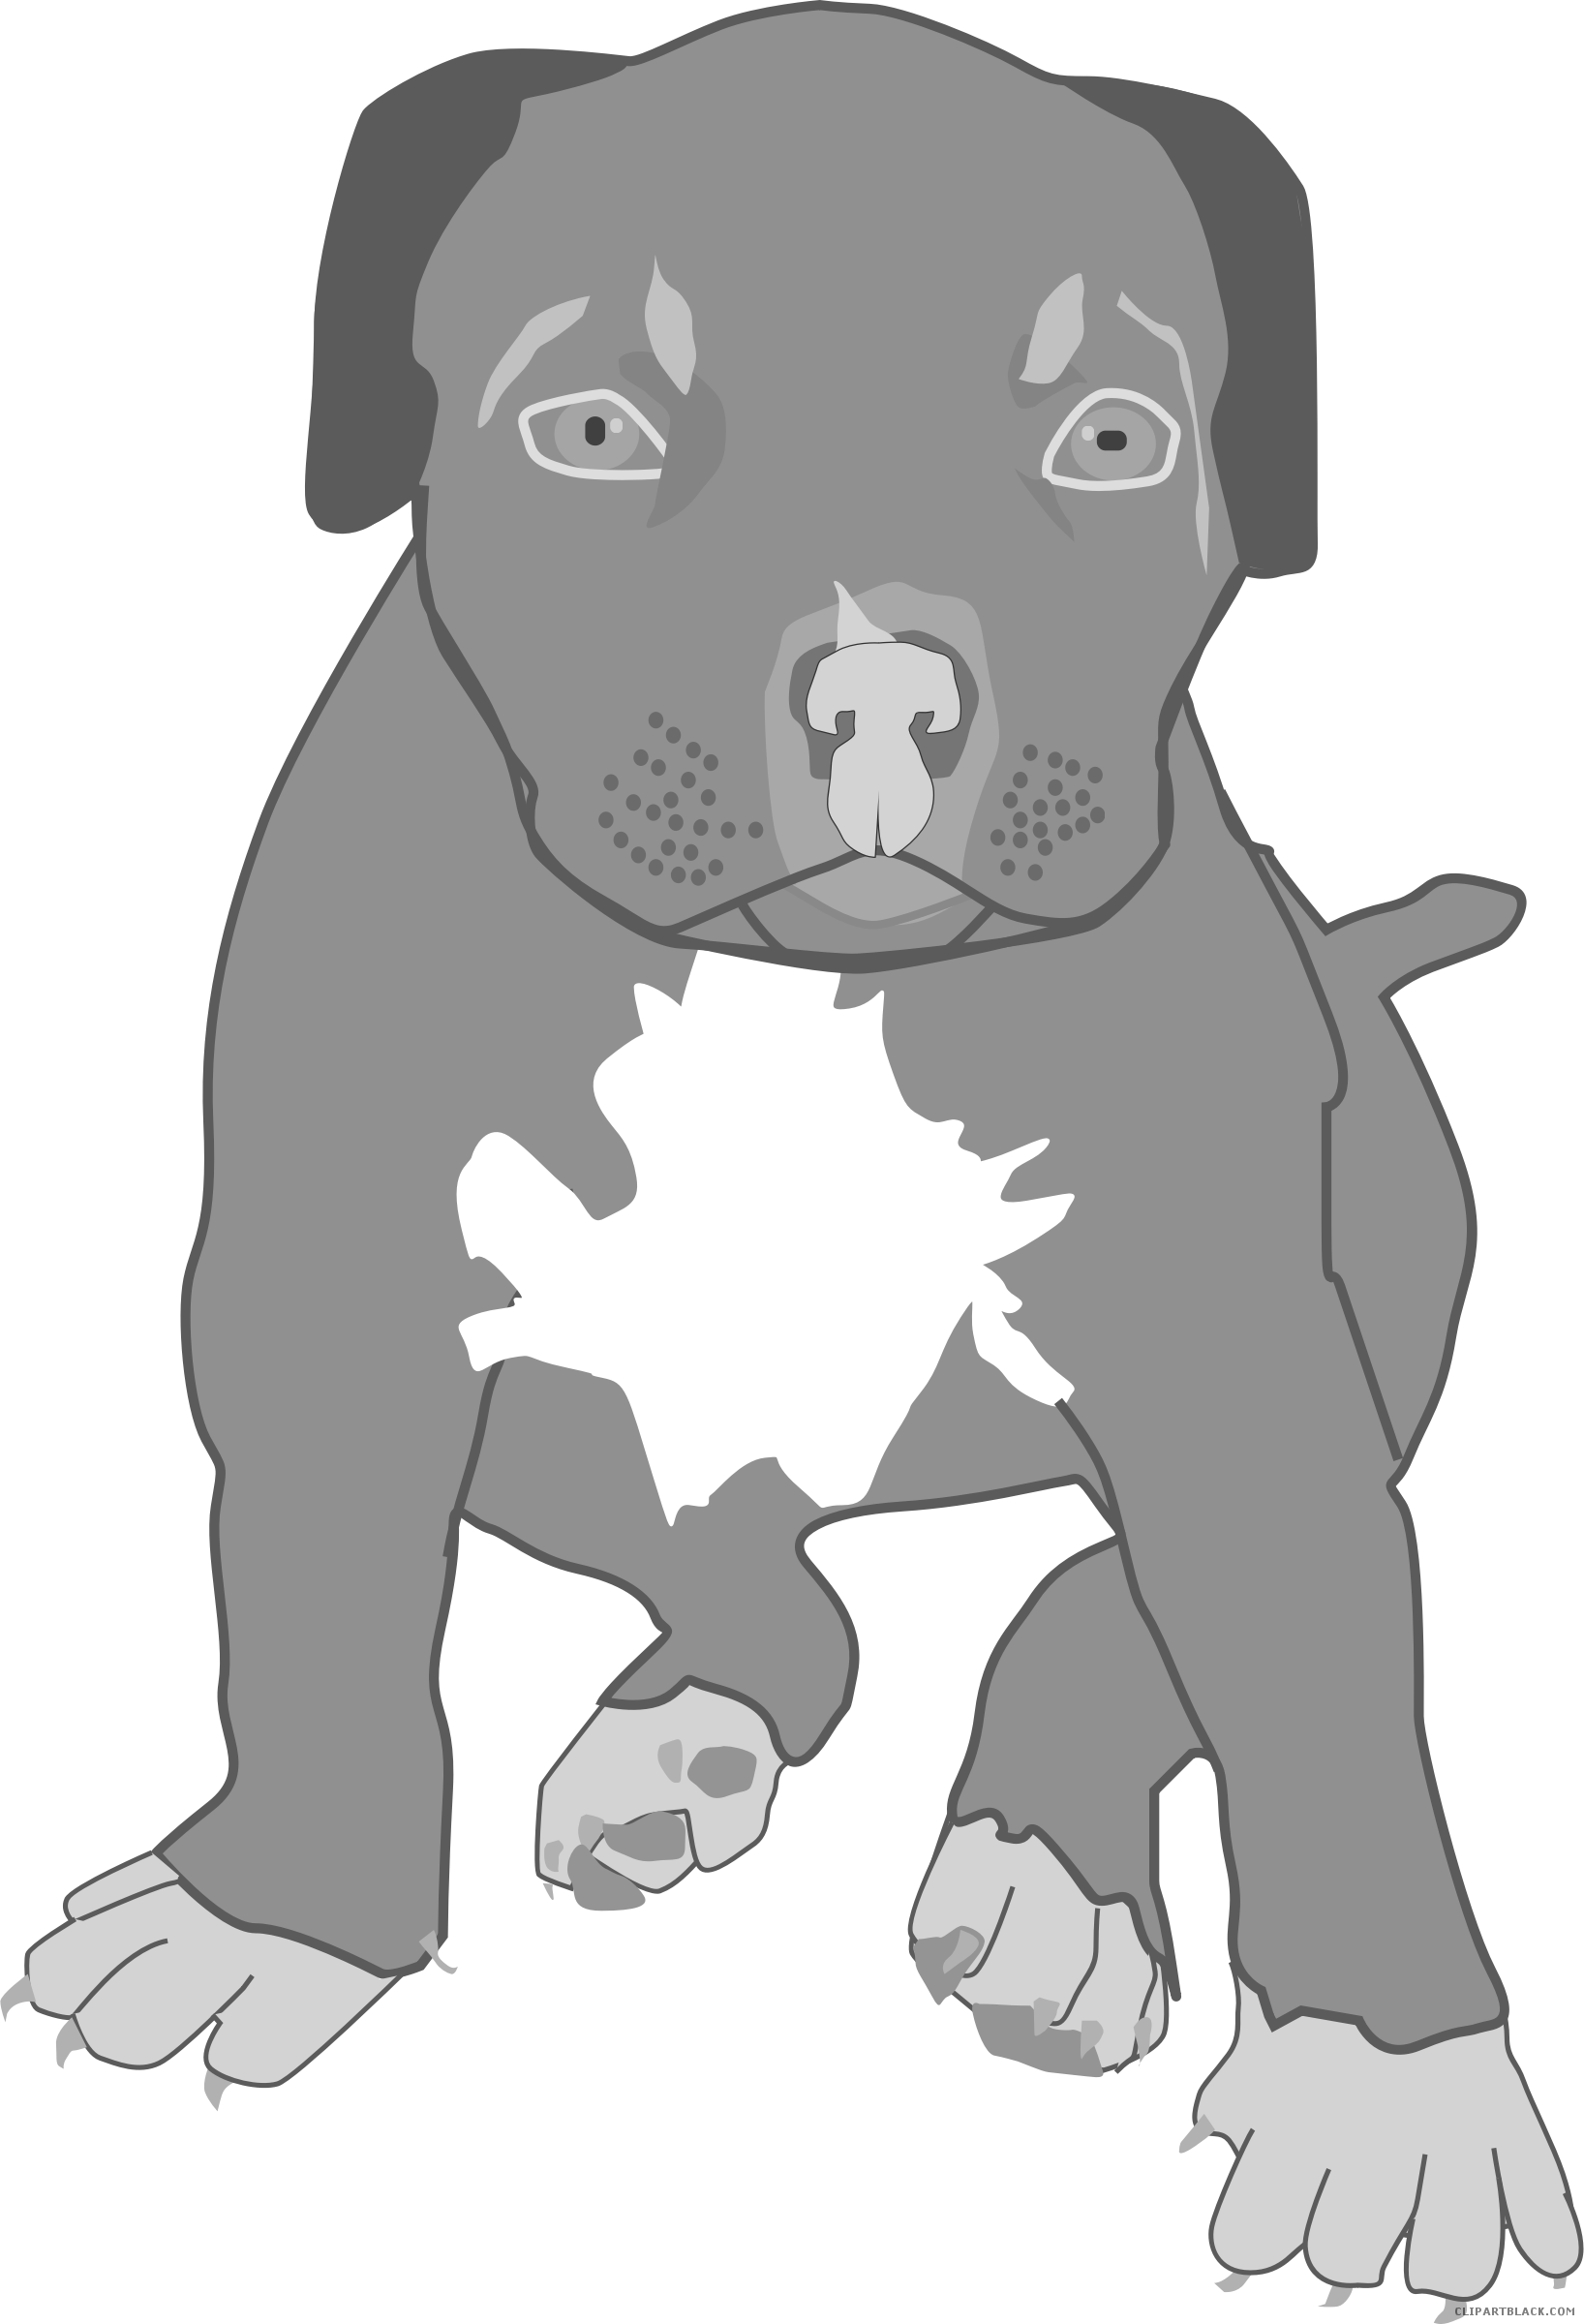 Pitbull dog clipart clip free Pitbull Clipart - Page 2 of 2 - ClipartBlack.com clip free